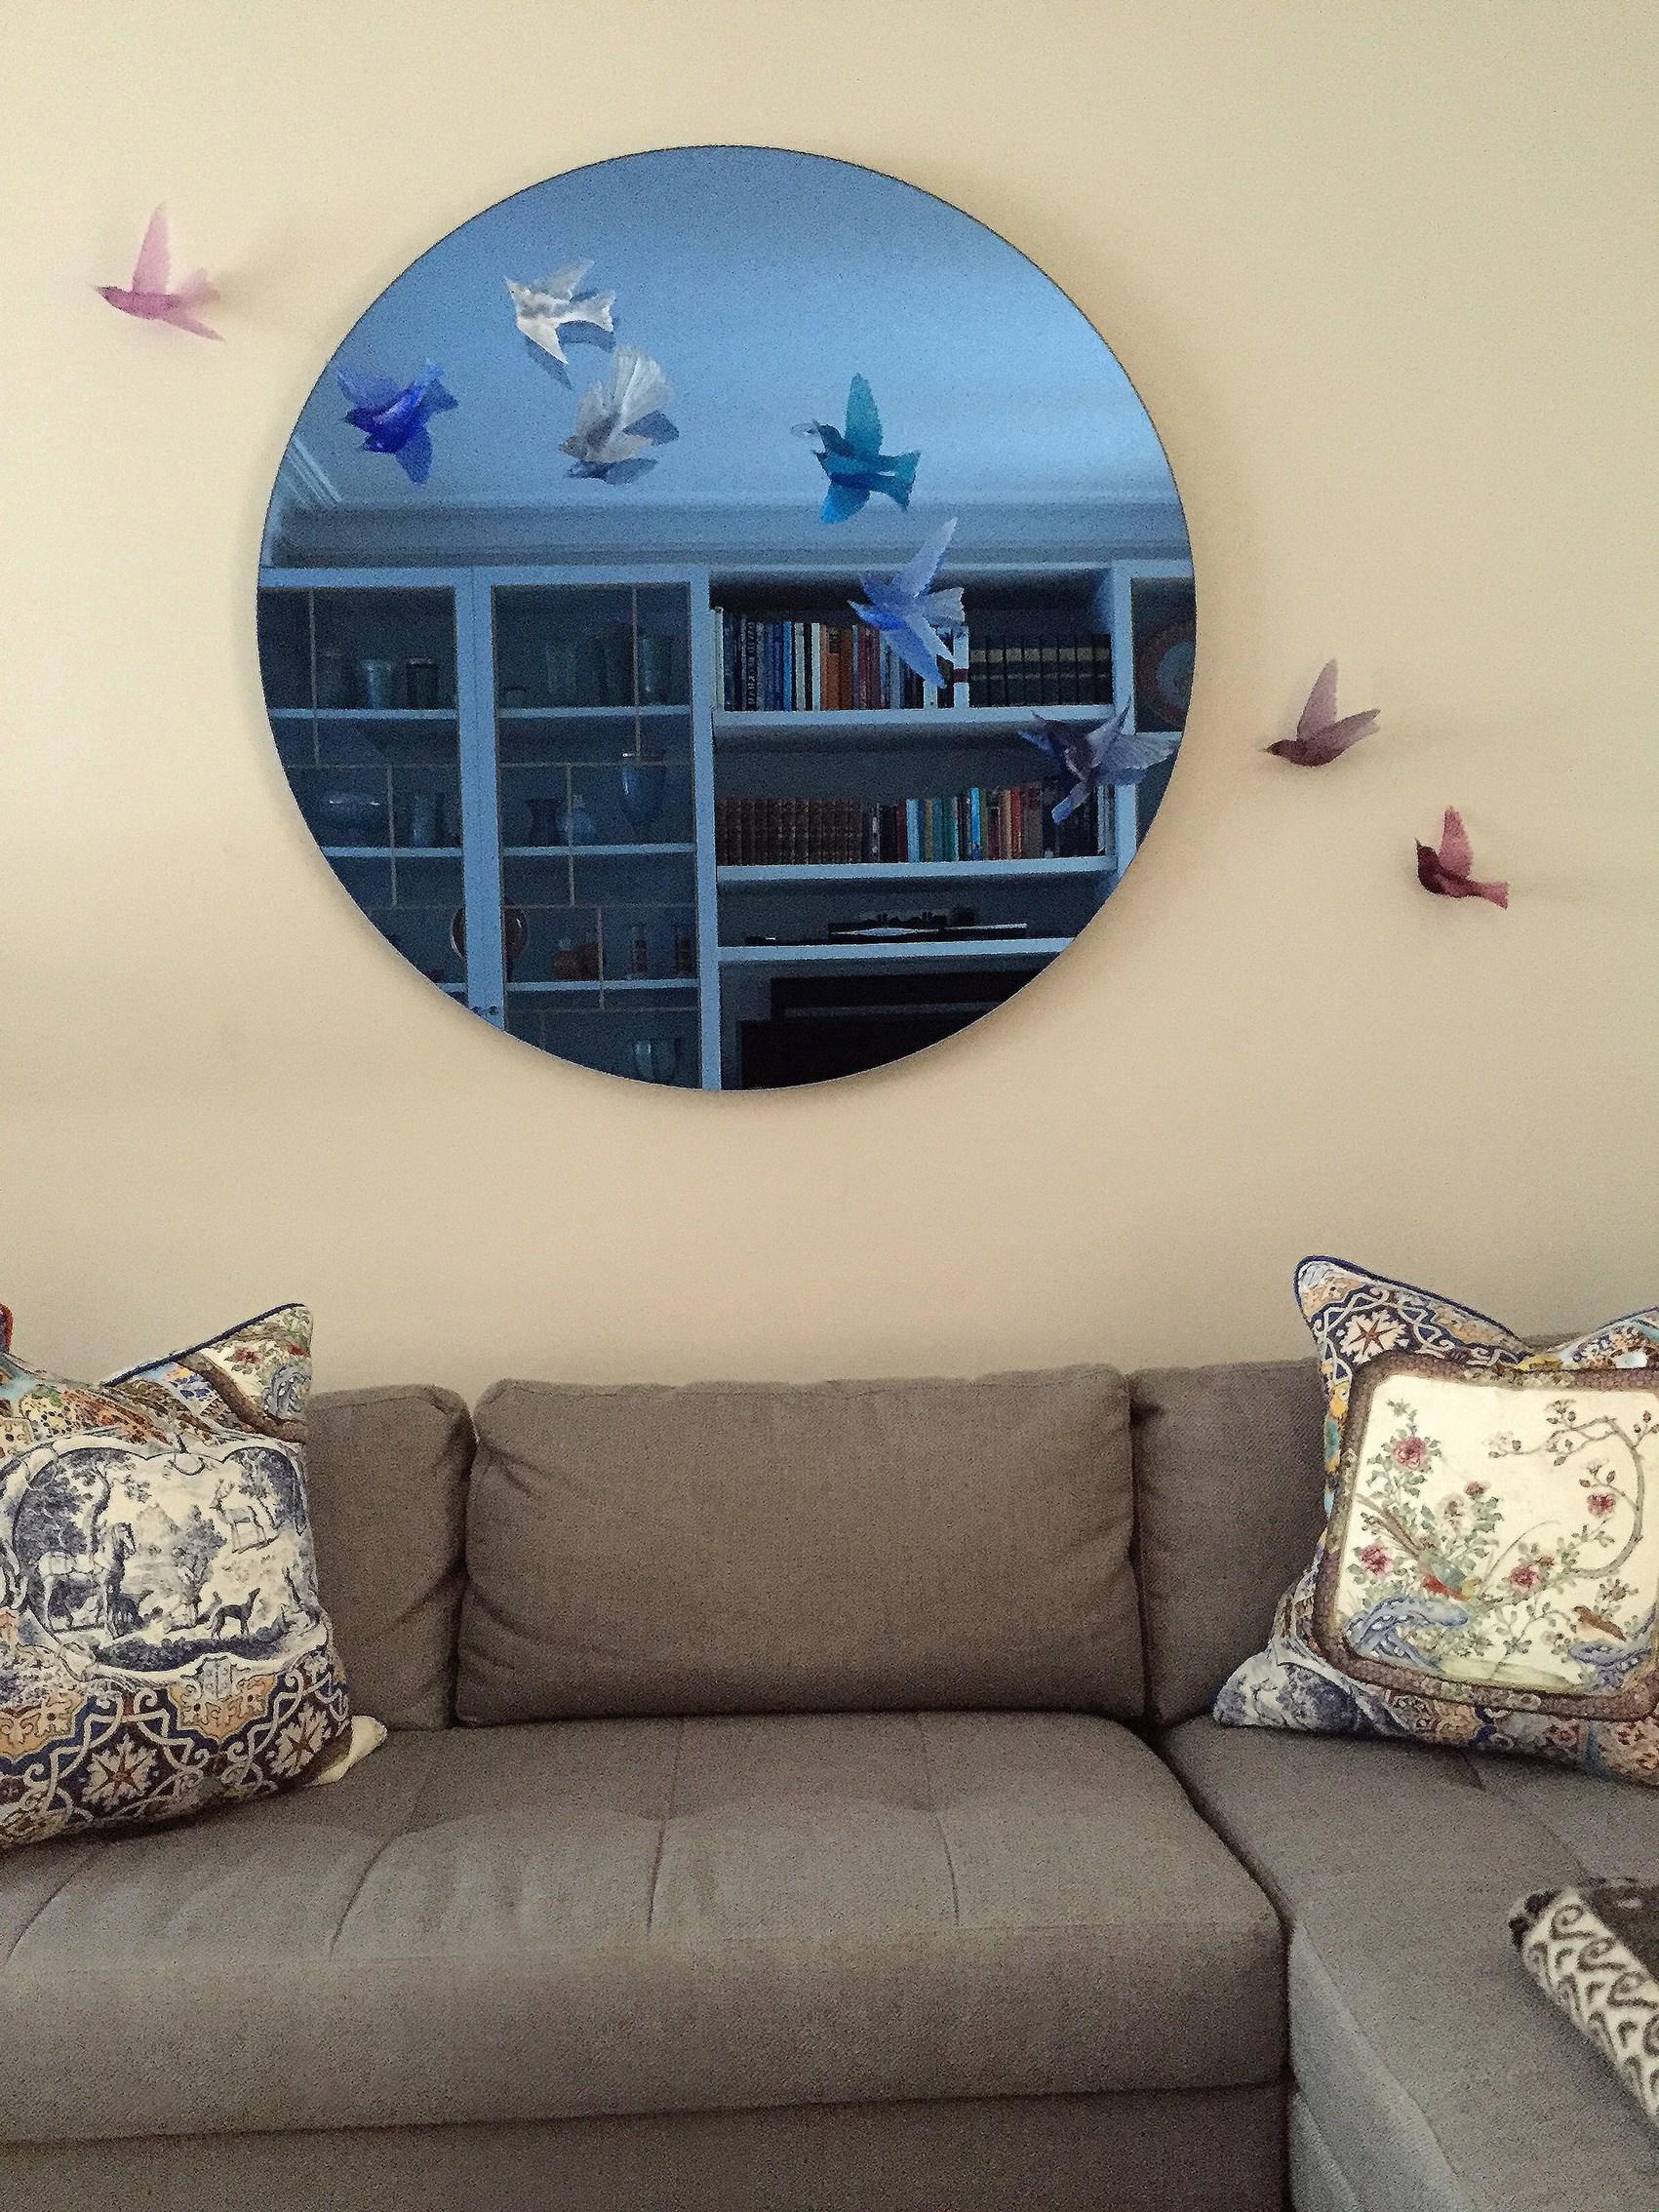 living room decorative mirror art with lukeke design birds